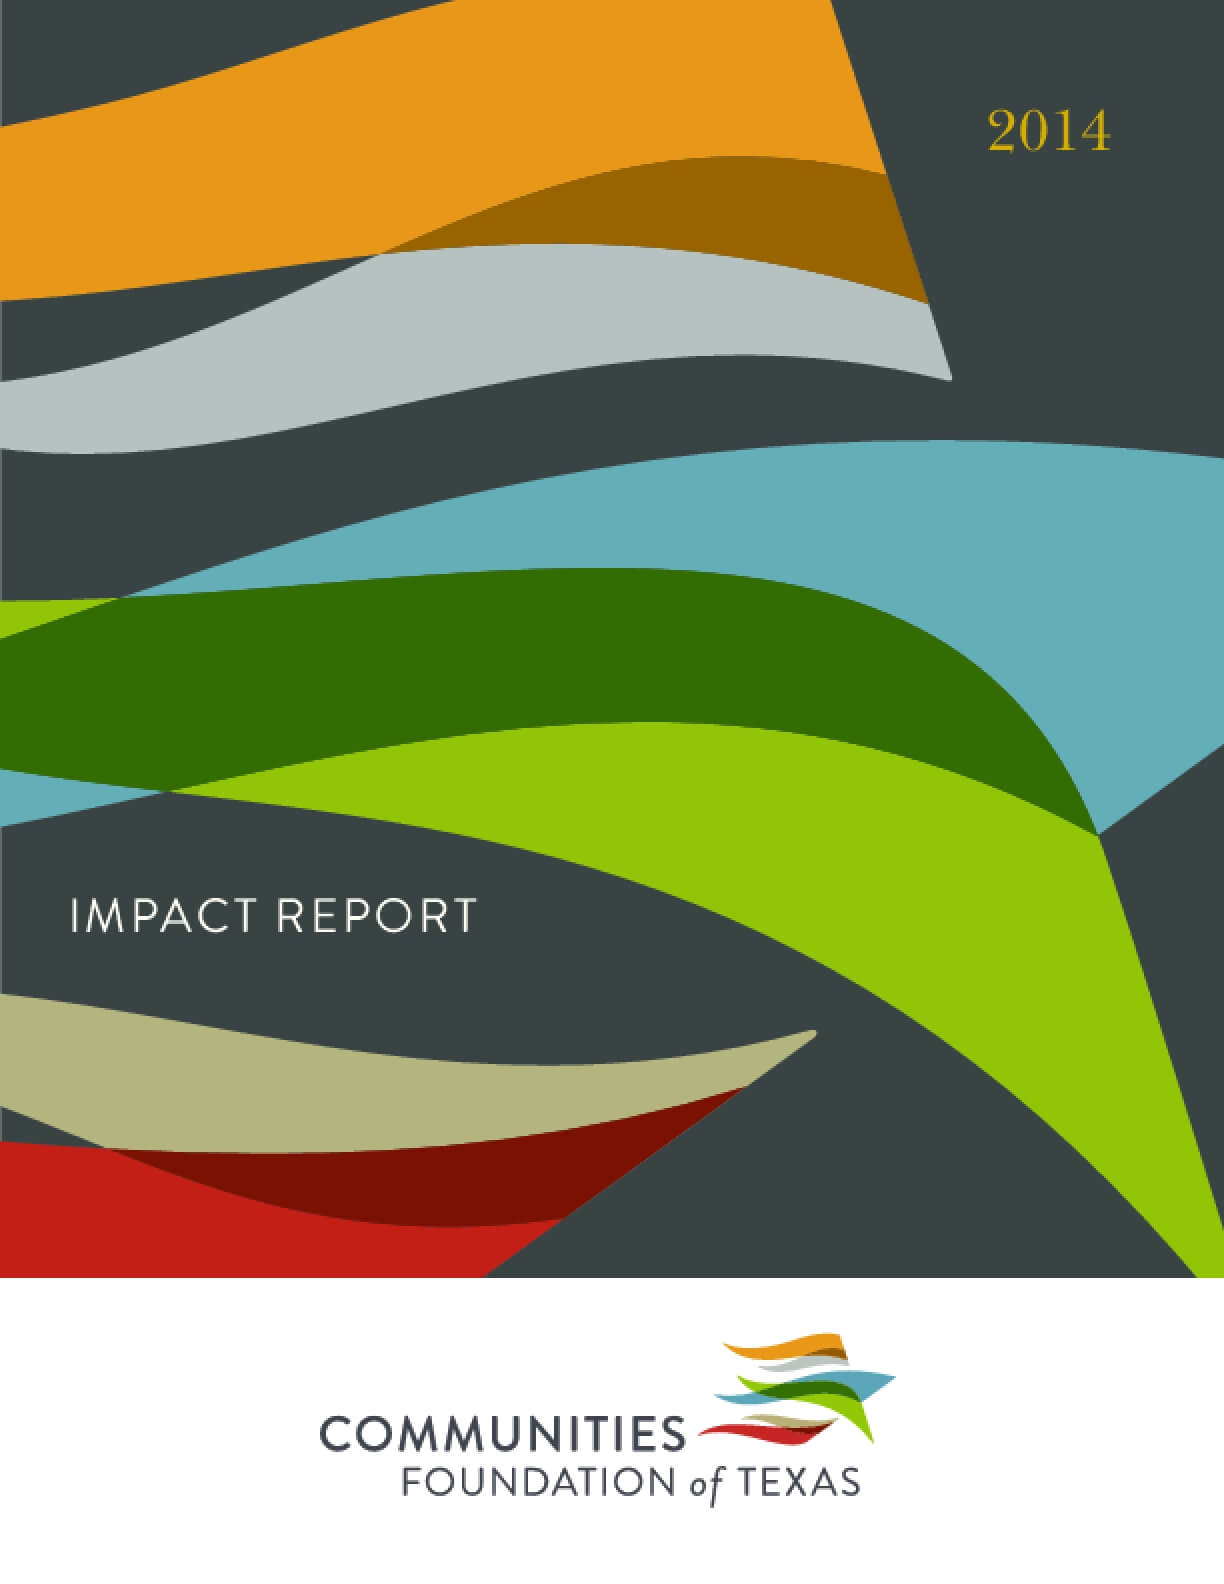 Communities Foundation of Texas Impact Report 2014